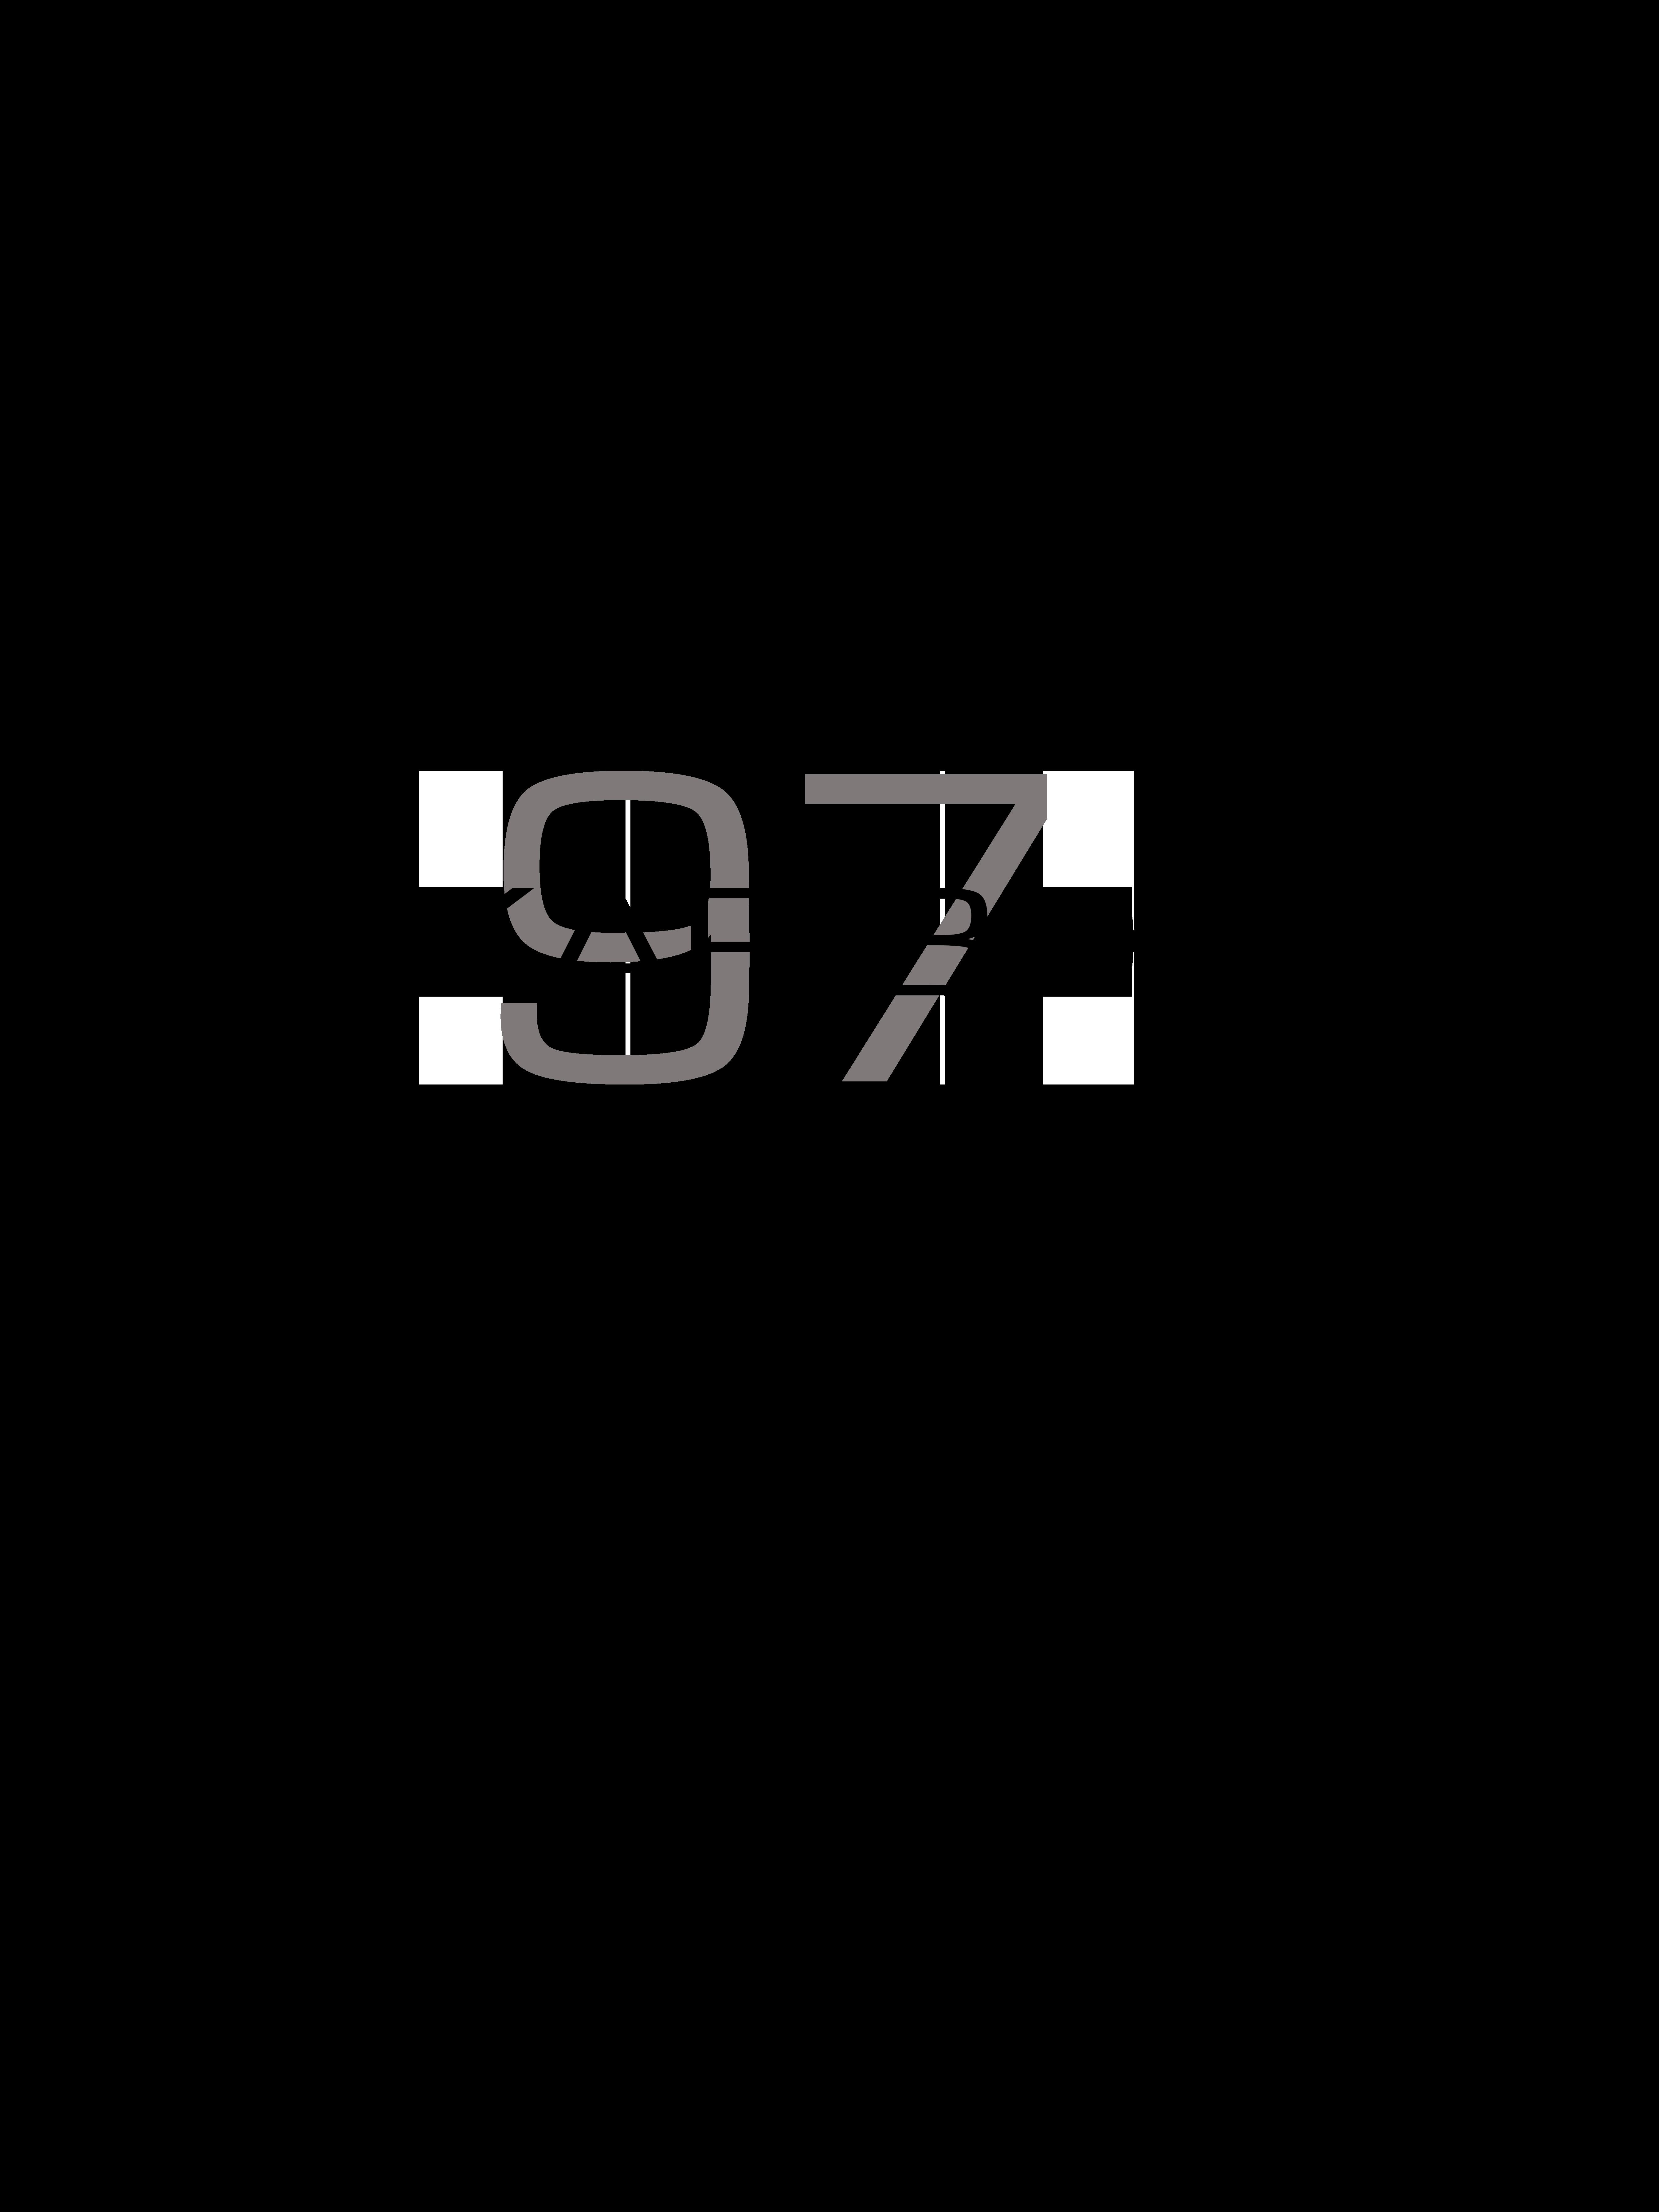 Logo 2k18 2